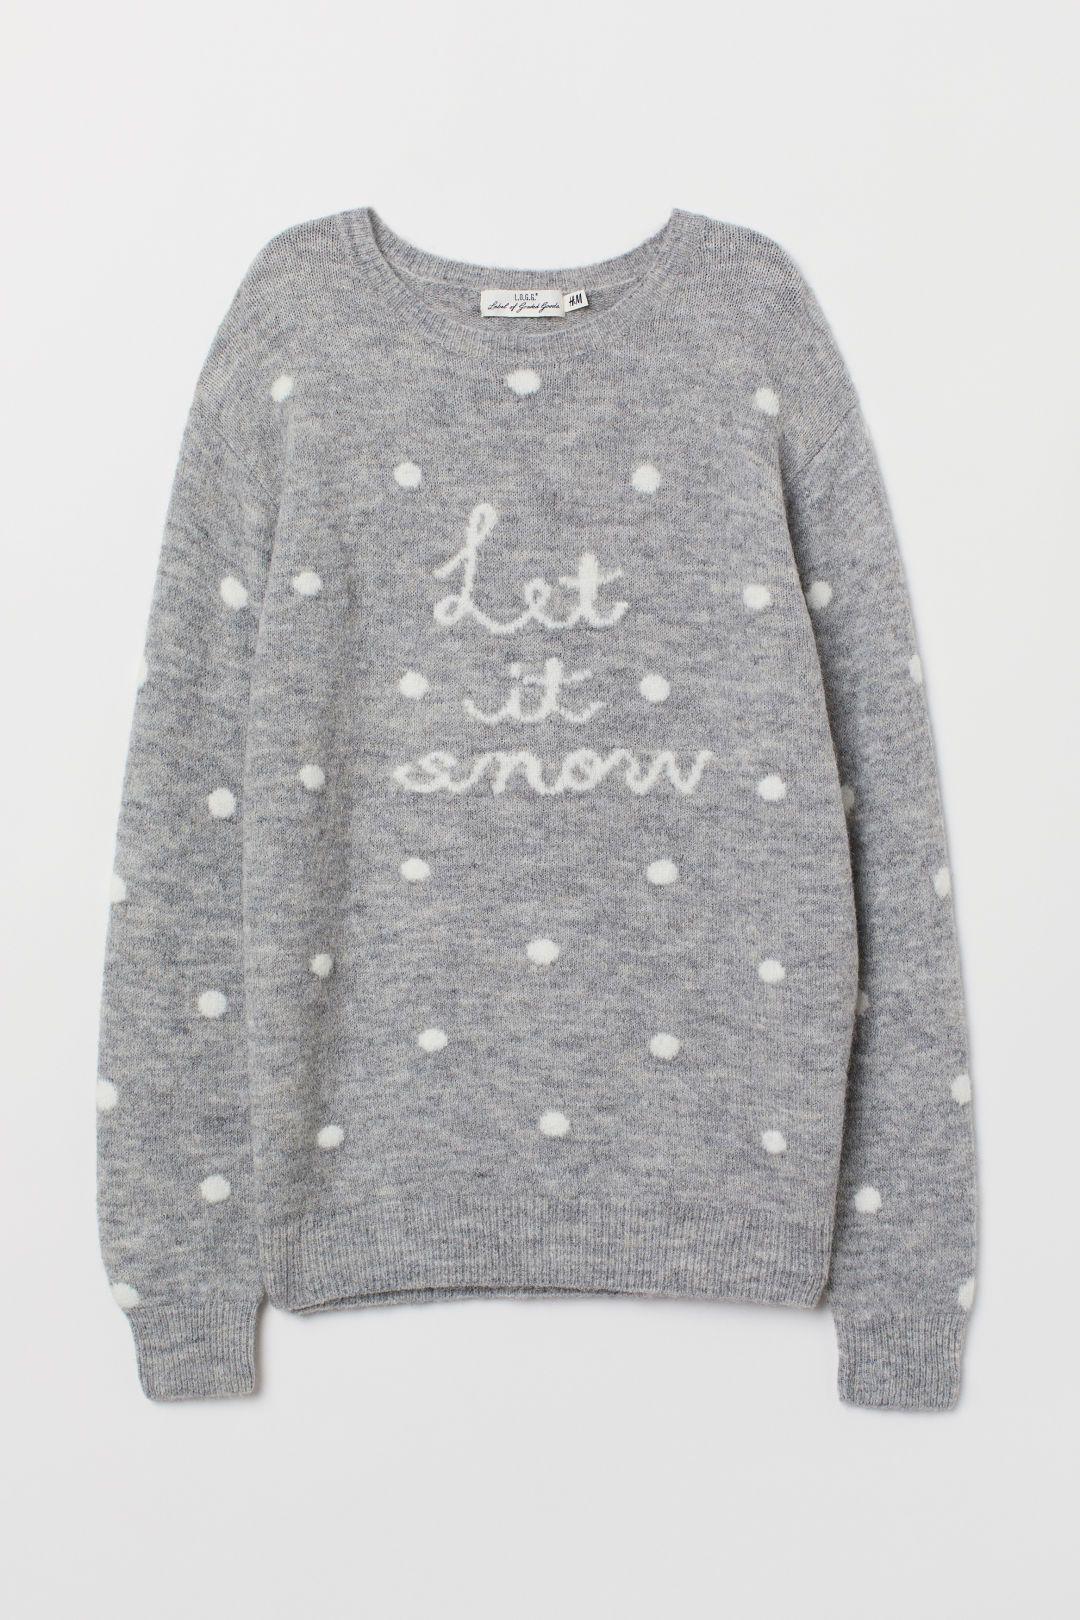 Christmas Jumper Ladies Women Cute Polar Bear Xmas Knit Sweater Pullover Grey